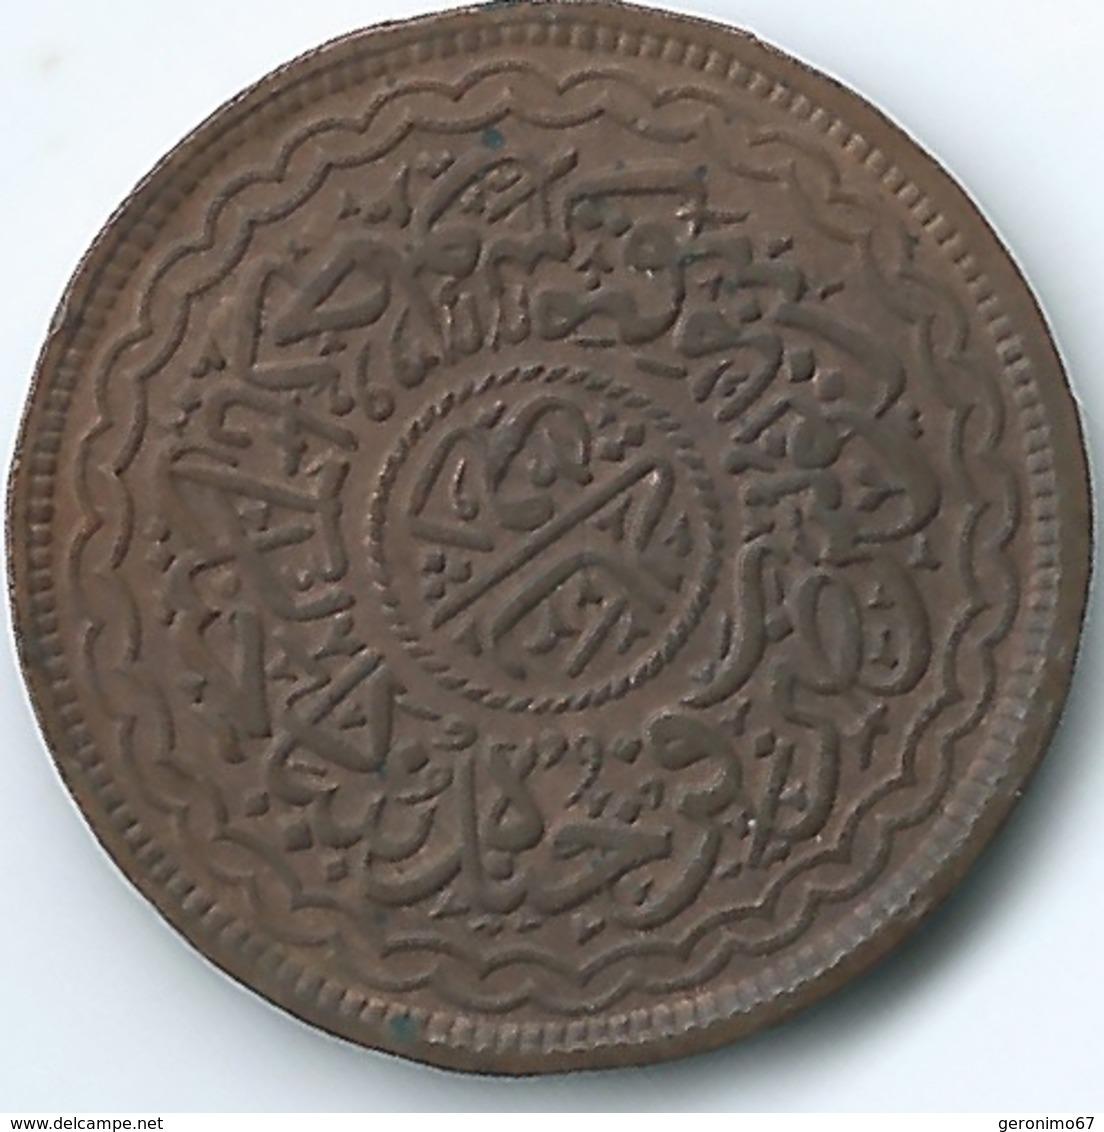 India - Princely States - Hyderabad - Mir Mahbub Ali Khan - 2 Pai - AH1329 (1911) - KMY35 (c. 20mm) - Inde